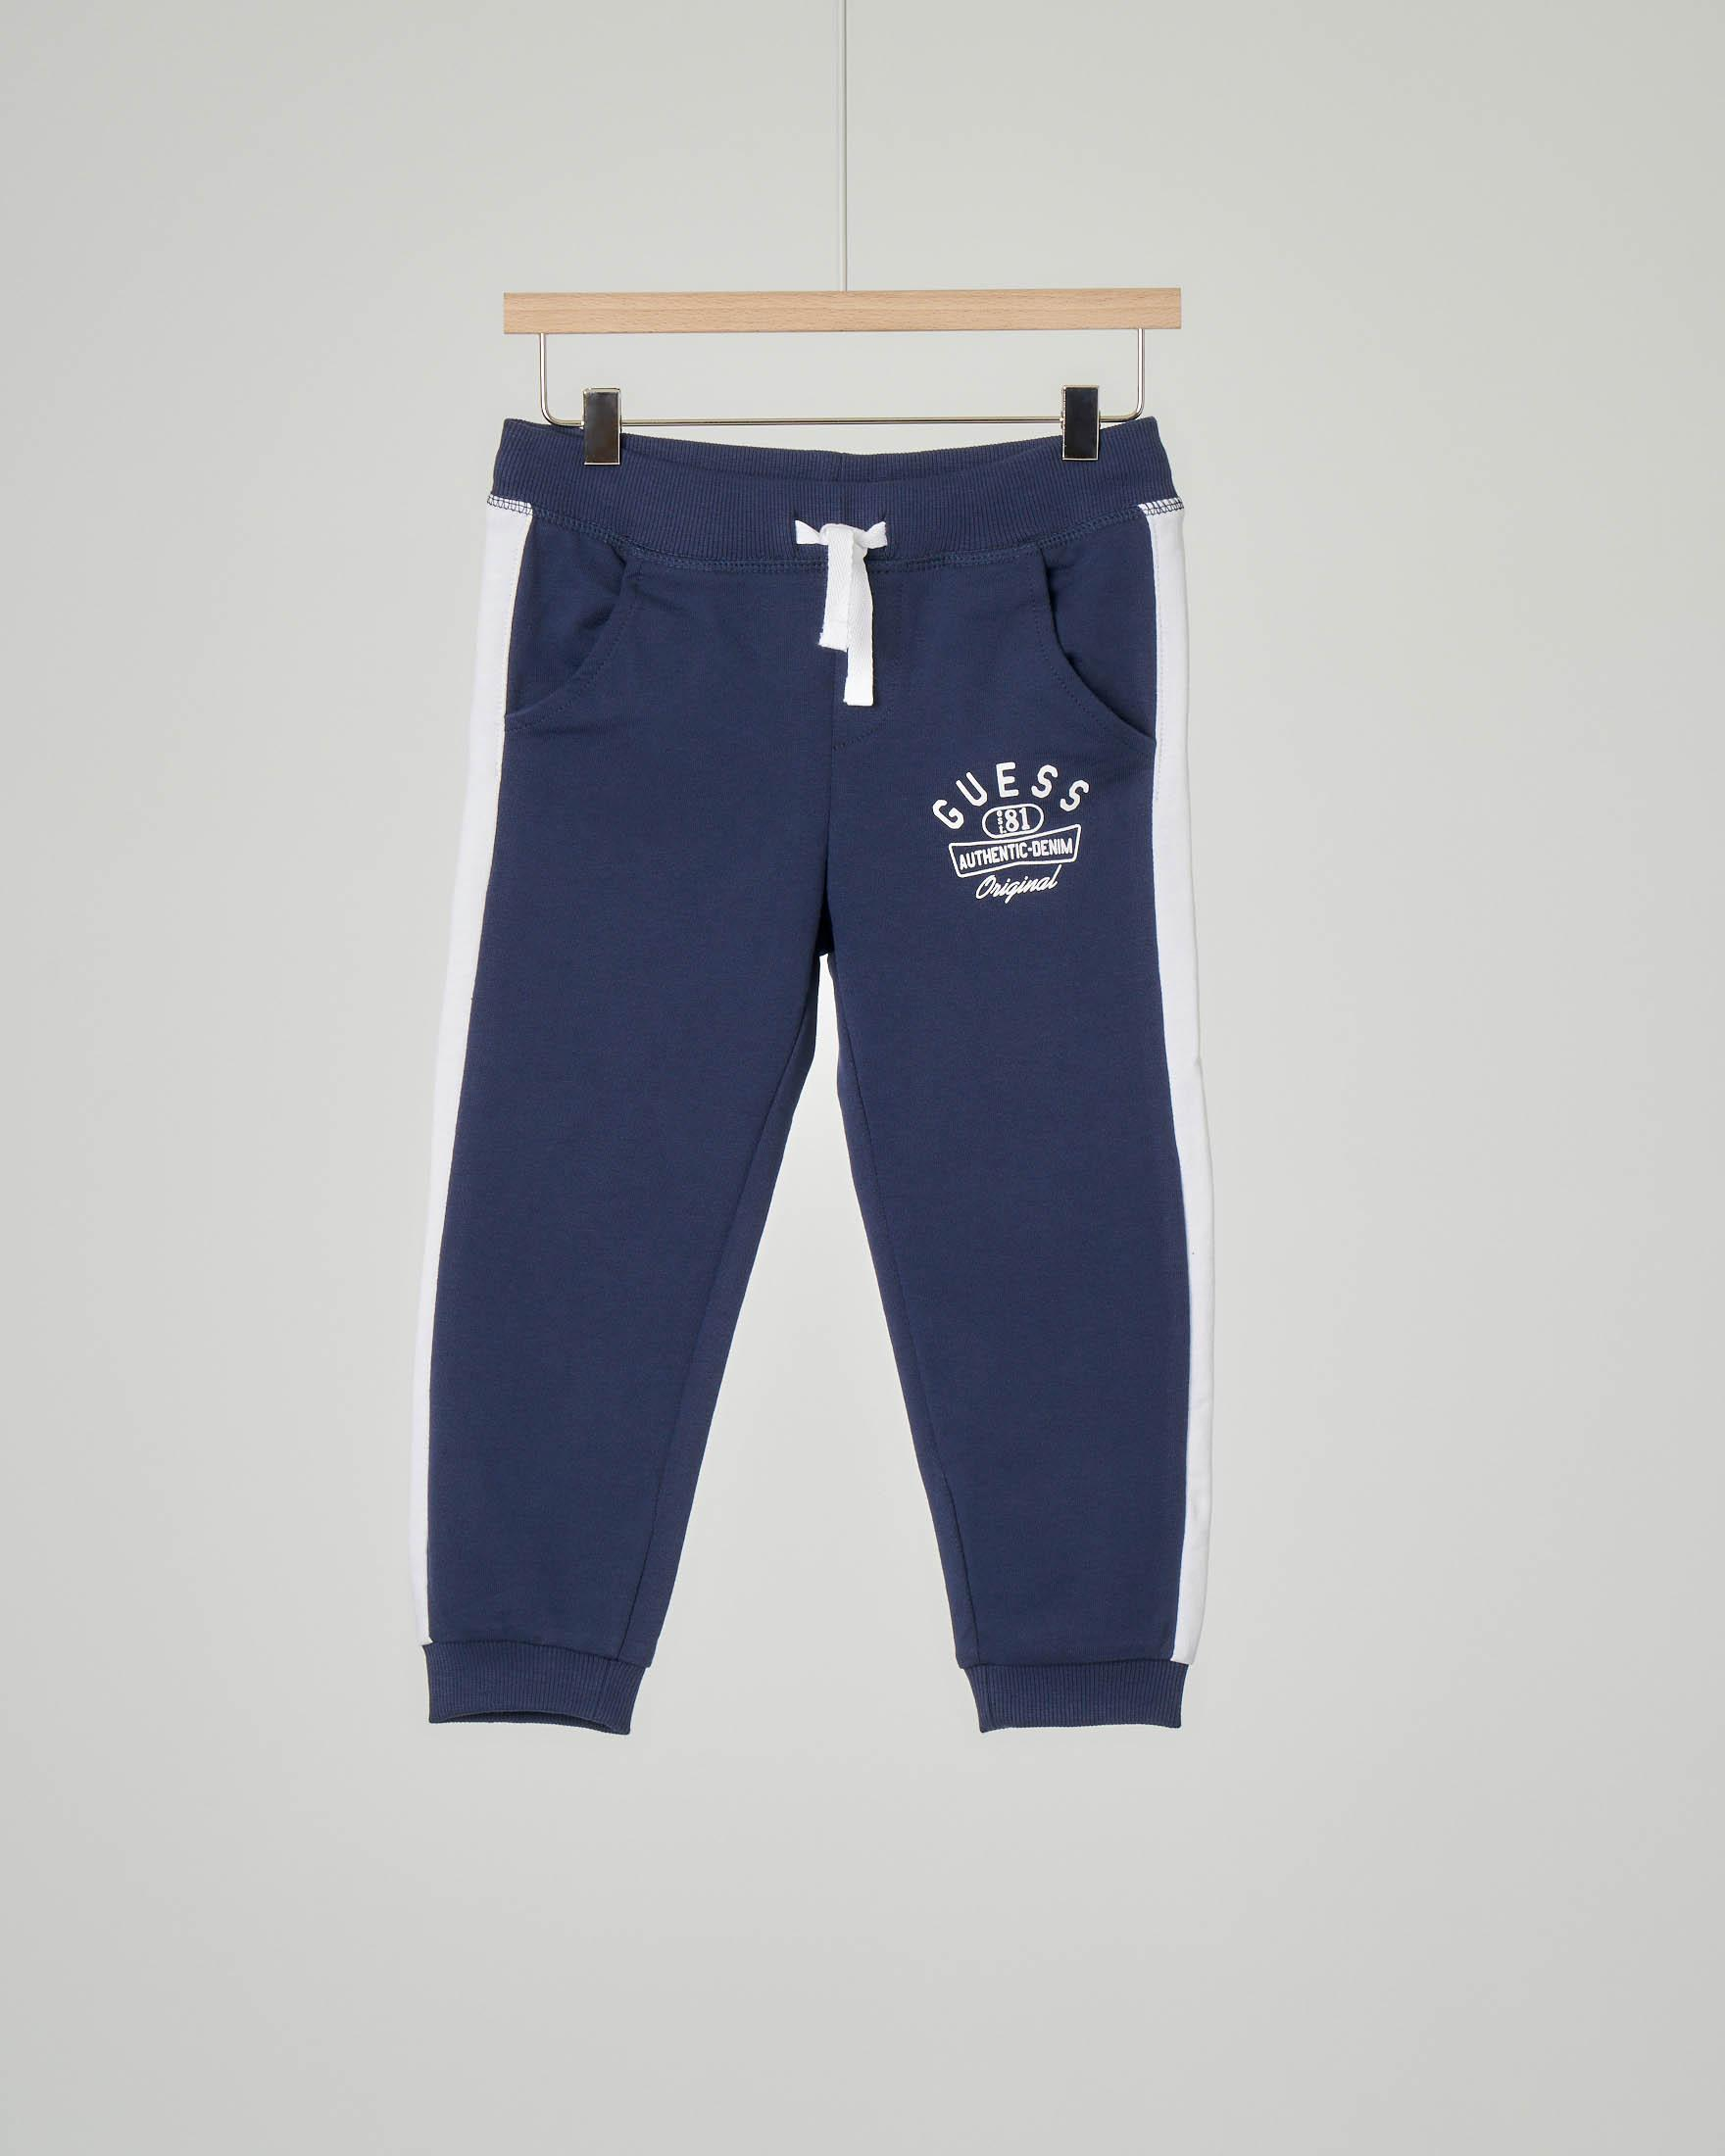 Pantalone in felpa blu